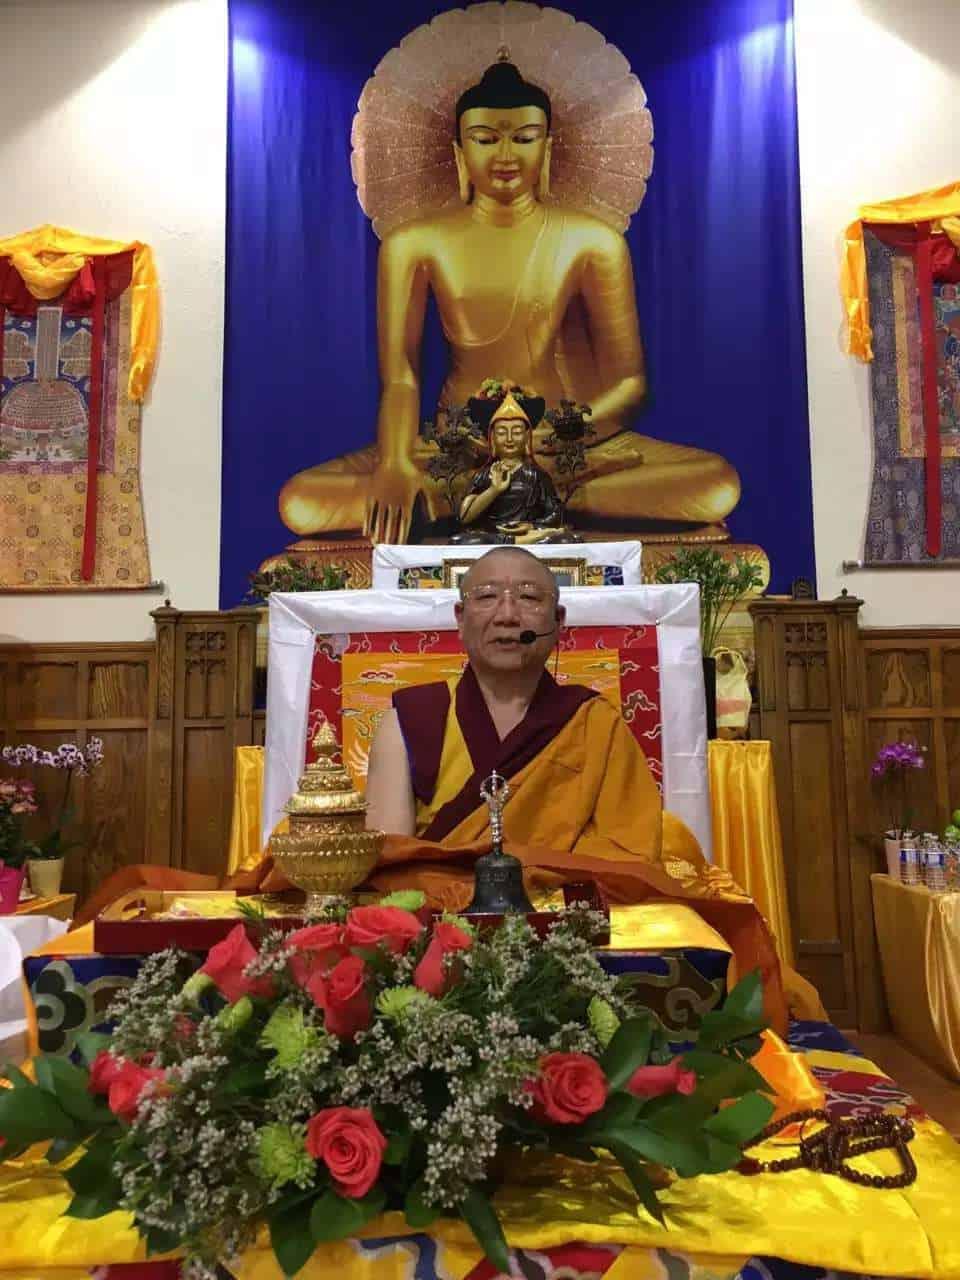 gosok-rinpoche-toronto-2016-7efc04a3684836d44a9928bc7eb96de